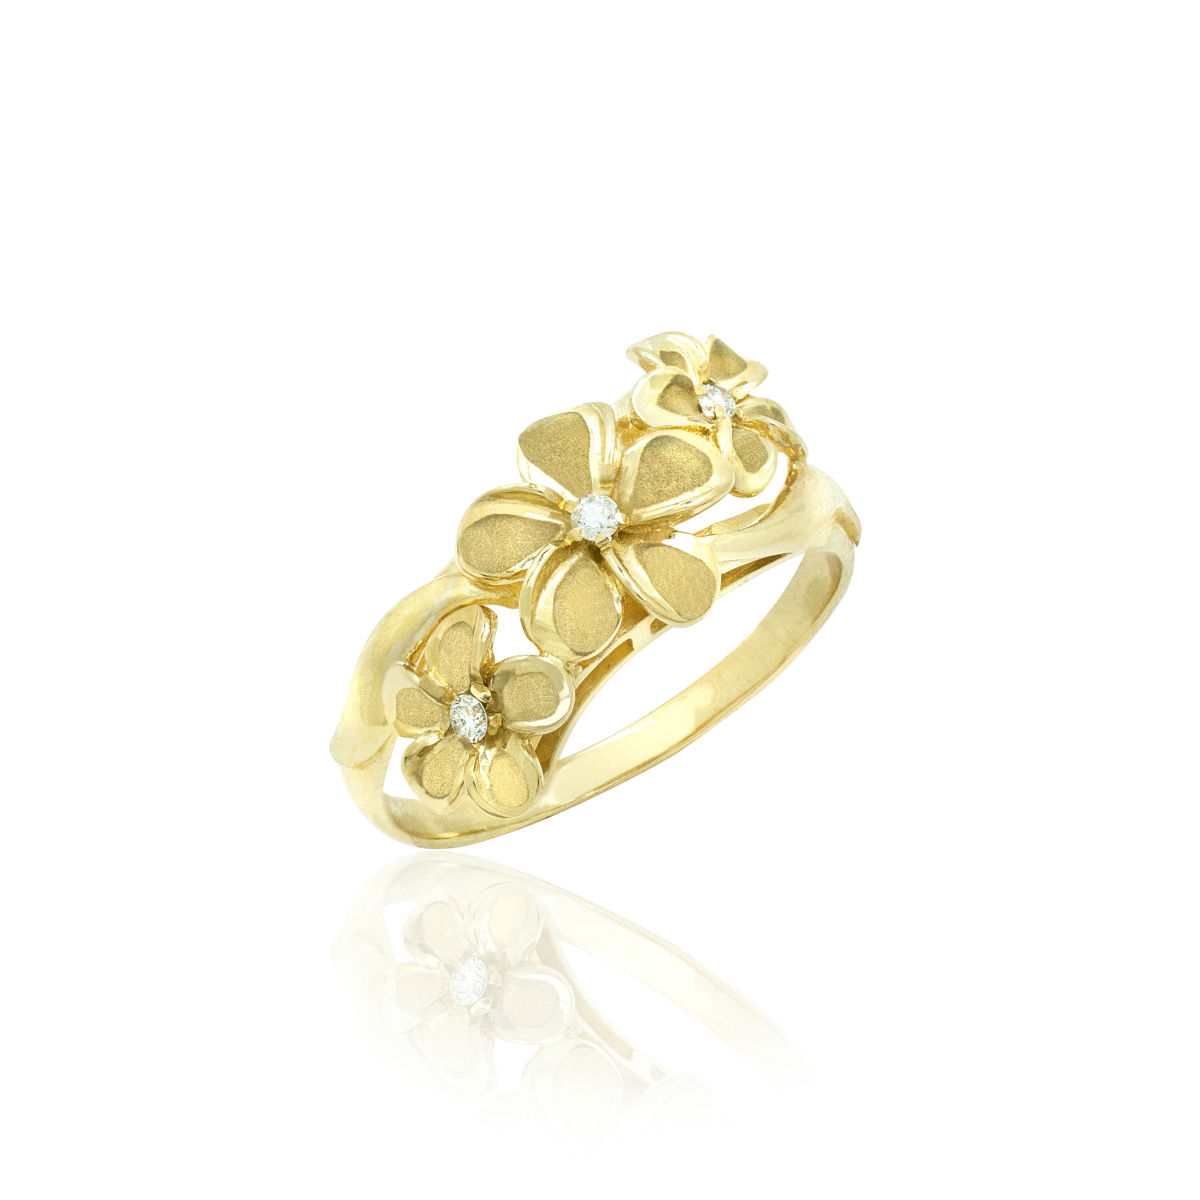 Queen Plumeria Triple Flower Ring with Diamonds